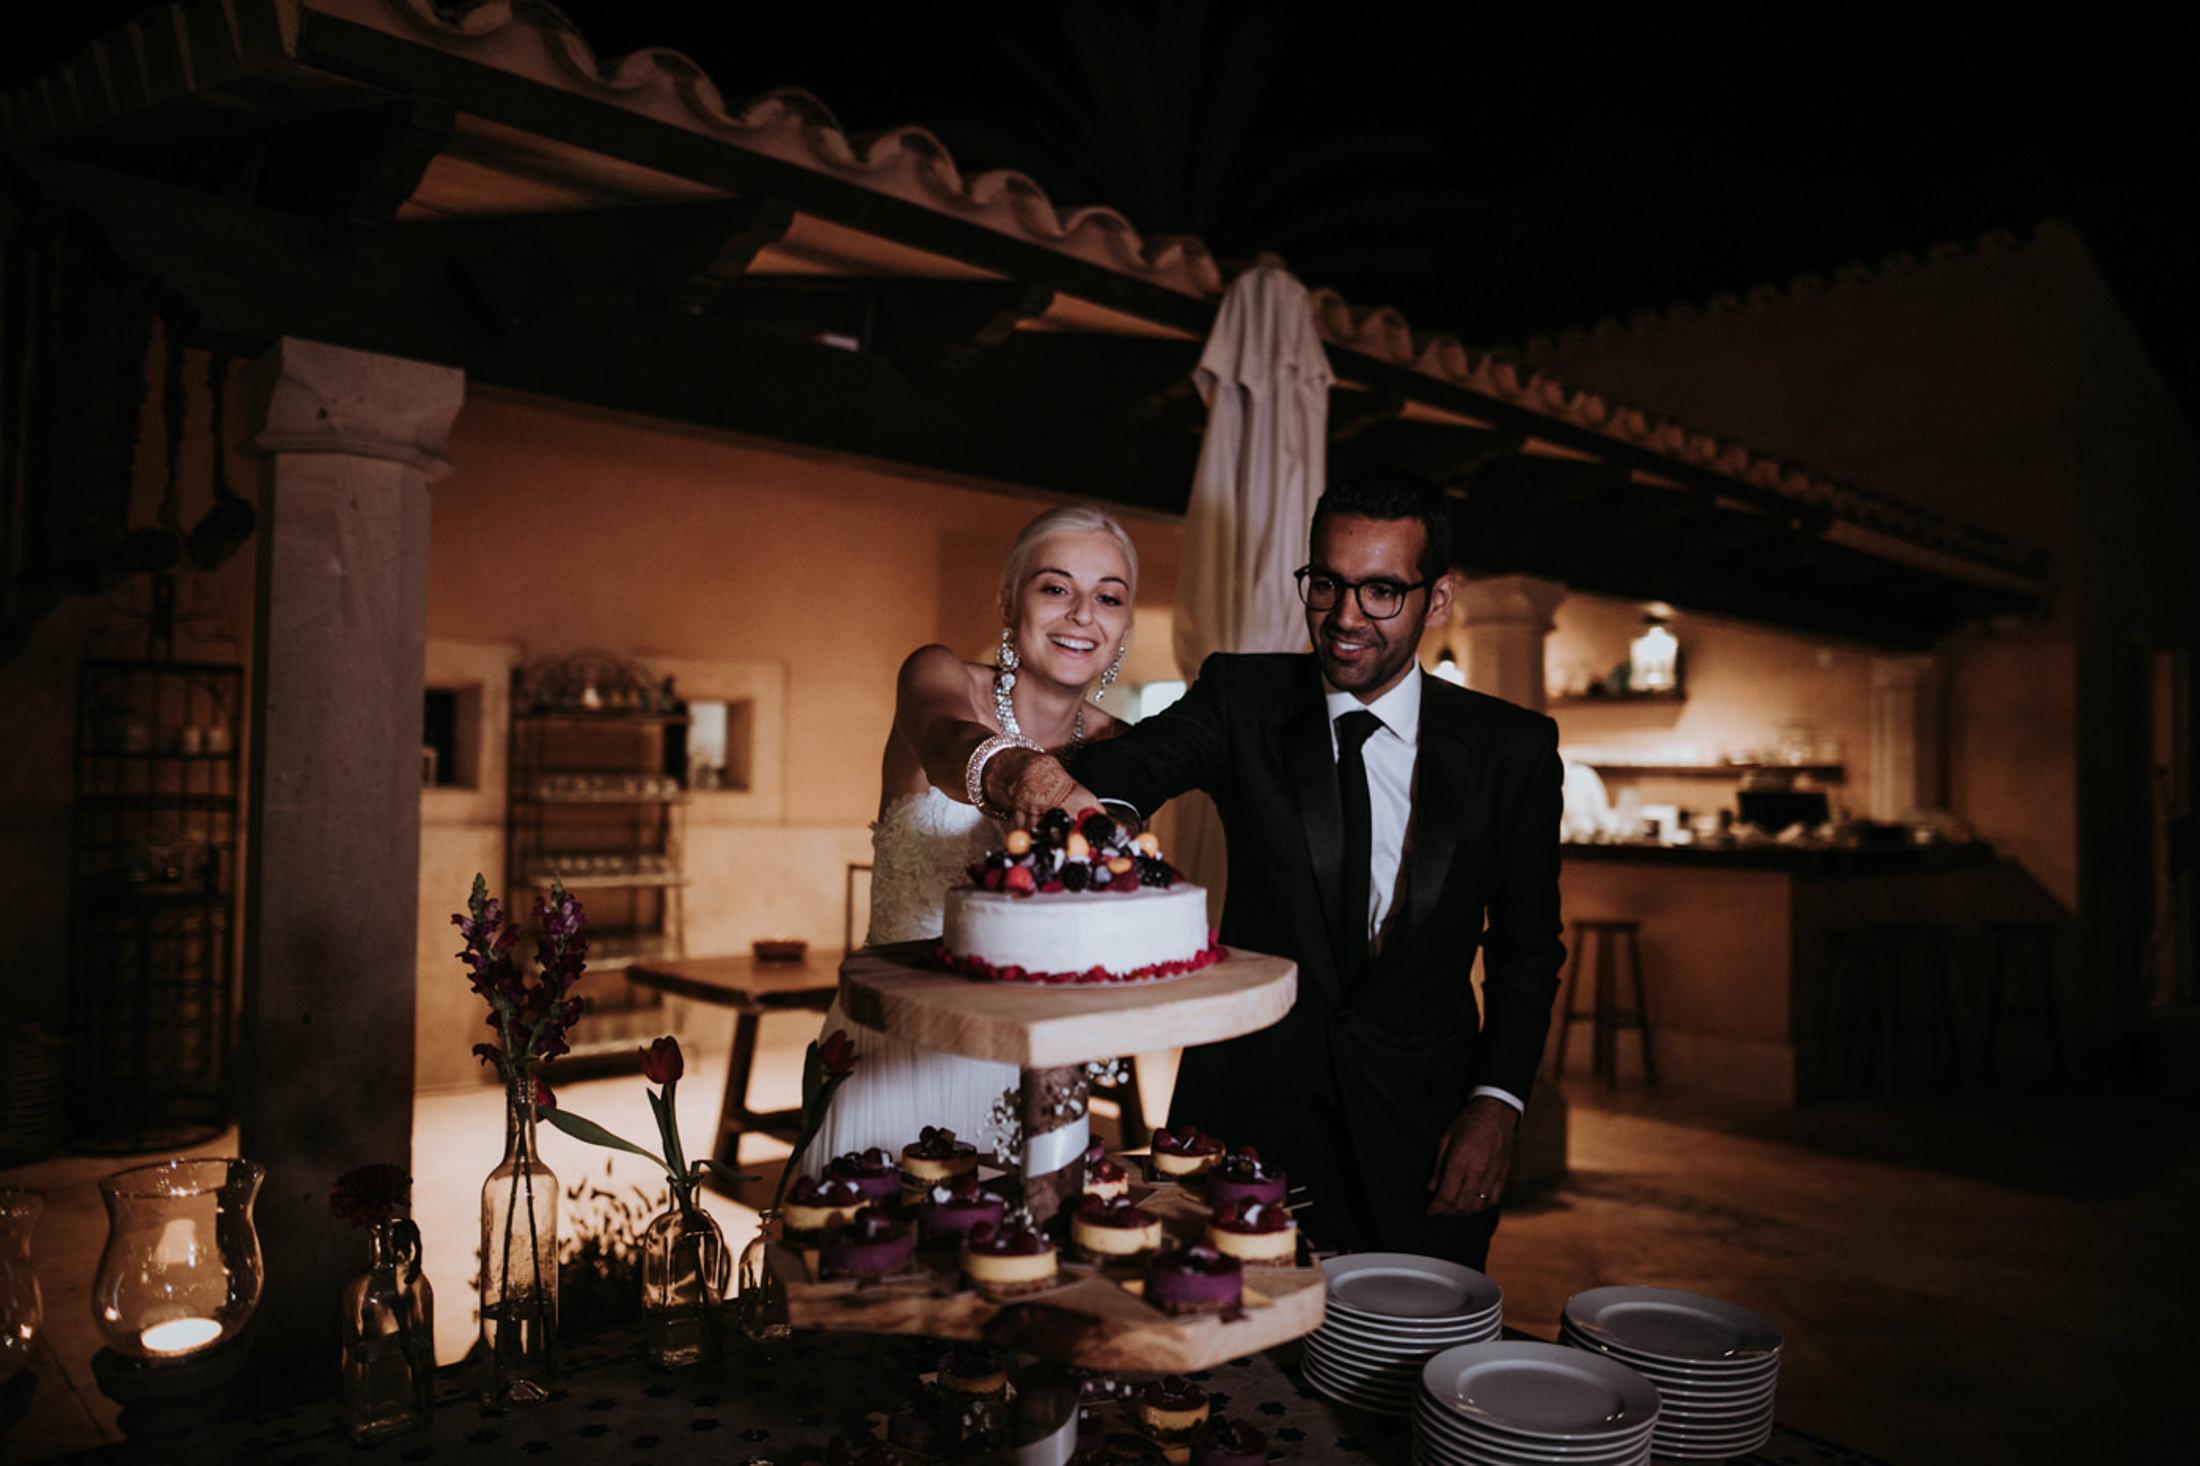 Wedding_Photographer_Mallorca_Daniela-Marquardt_Photography_New_York_Iceland_Tuscany_Santorini_Portugal_Austria_Bavaria_Elopement_Hochzeitsfotograf_AntjeRajat2_117